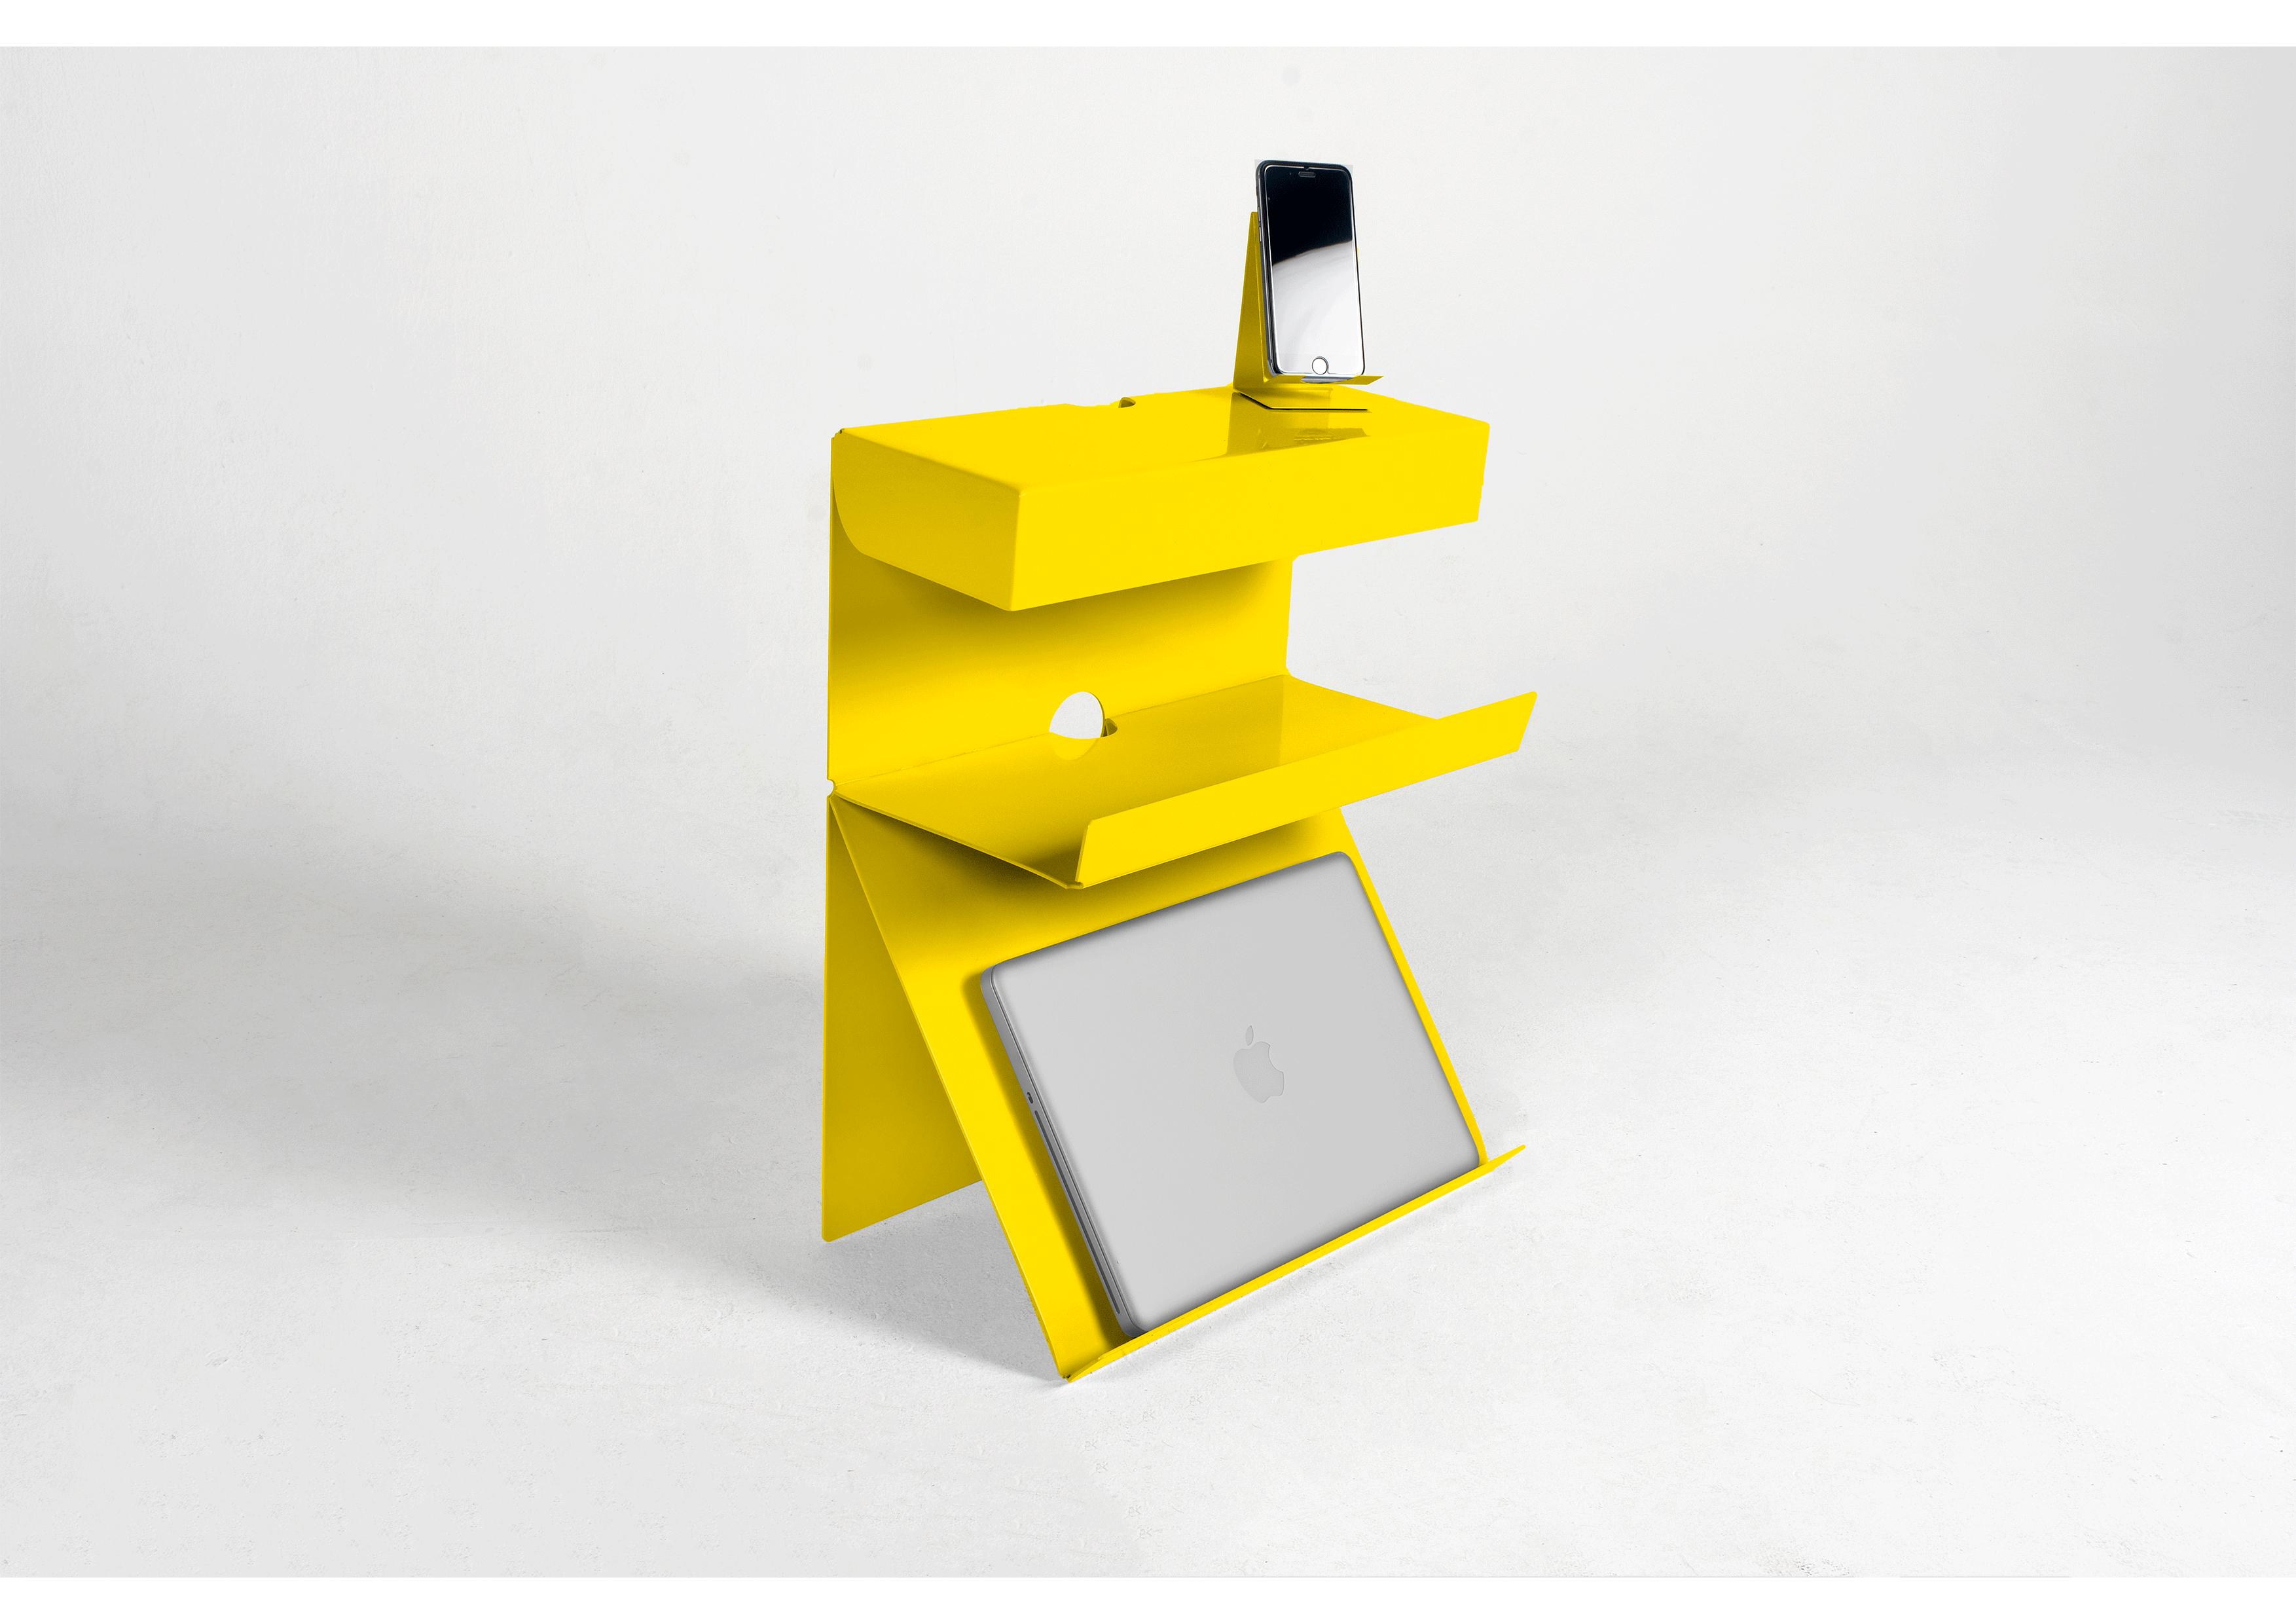 ktable.all-Artboard-1_7